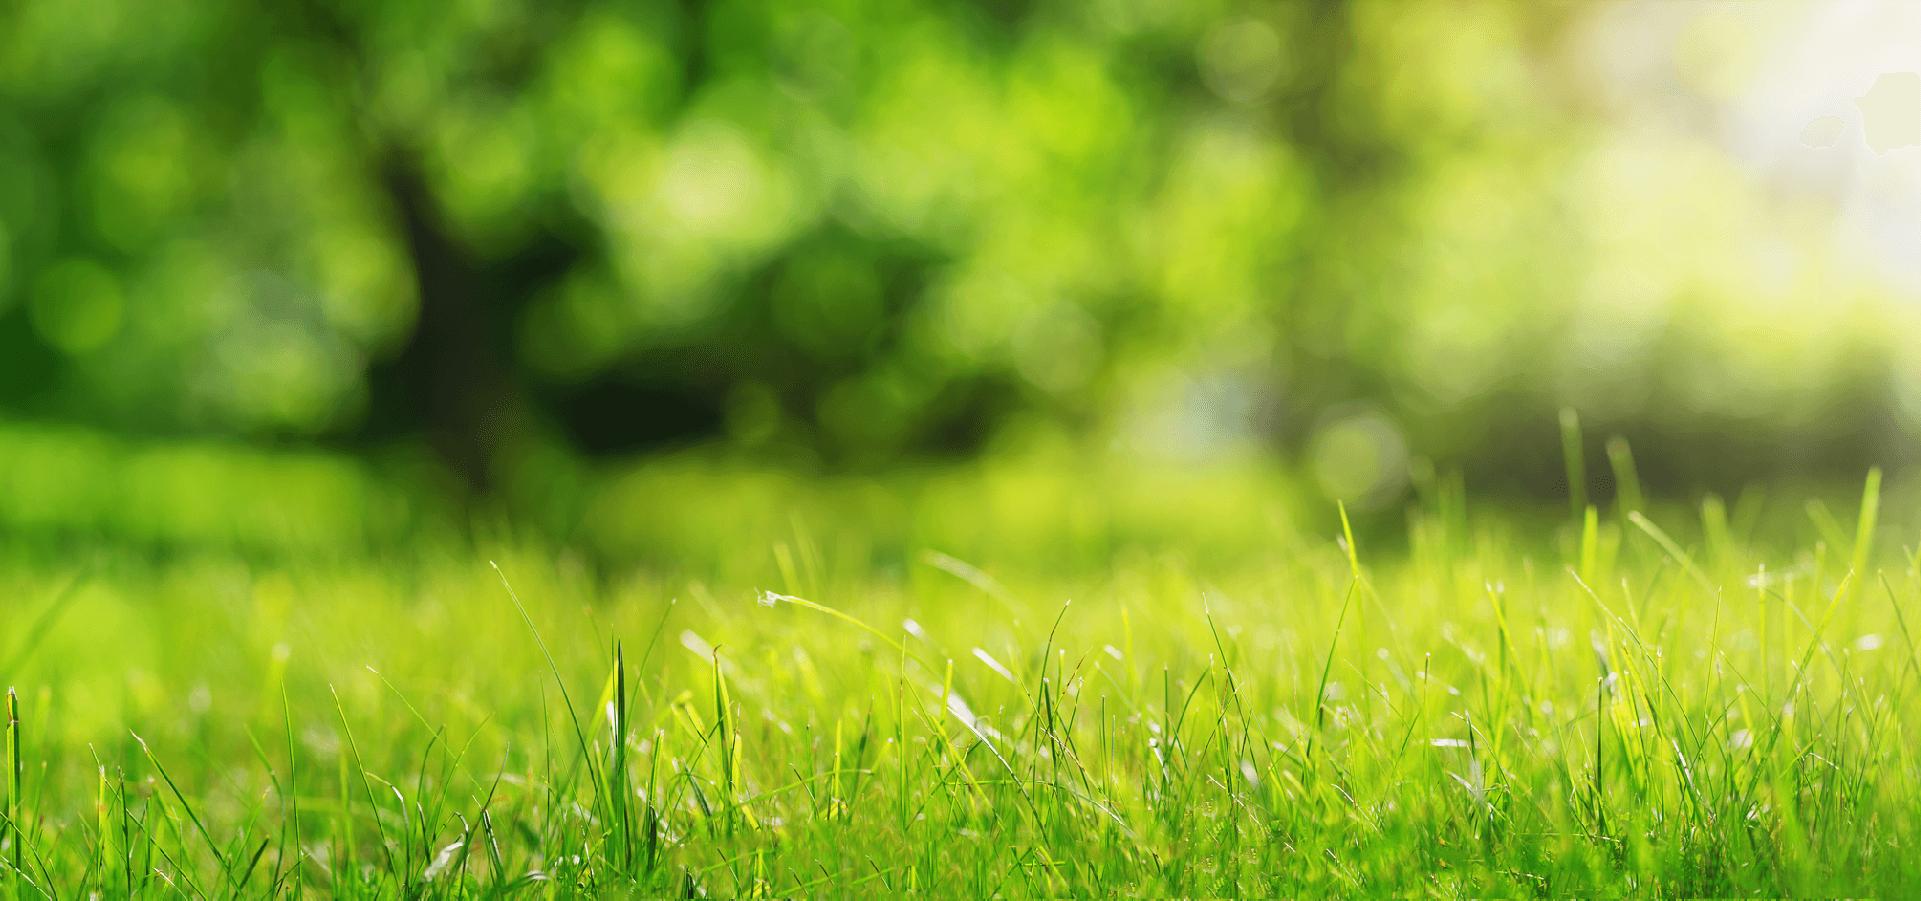 greengrass-life